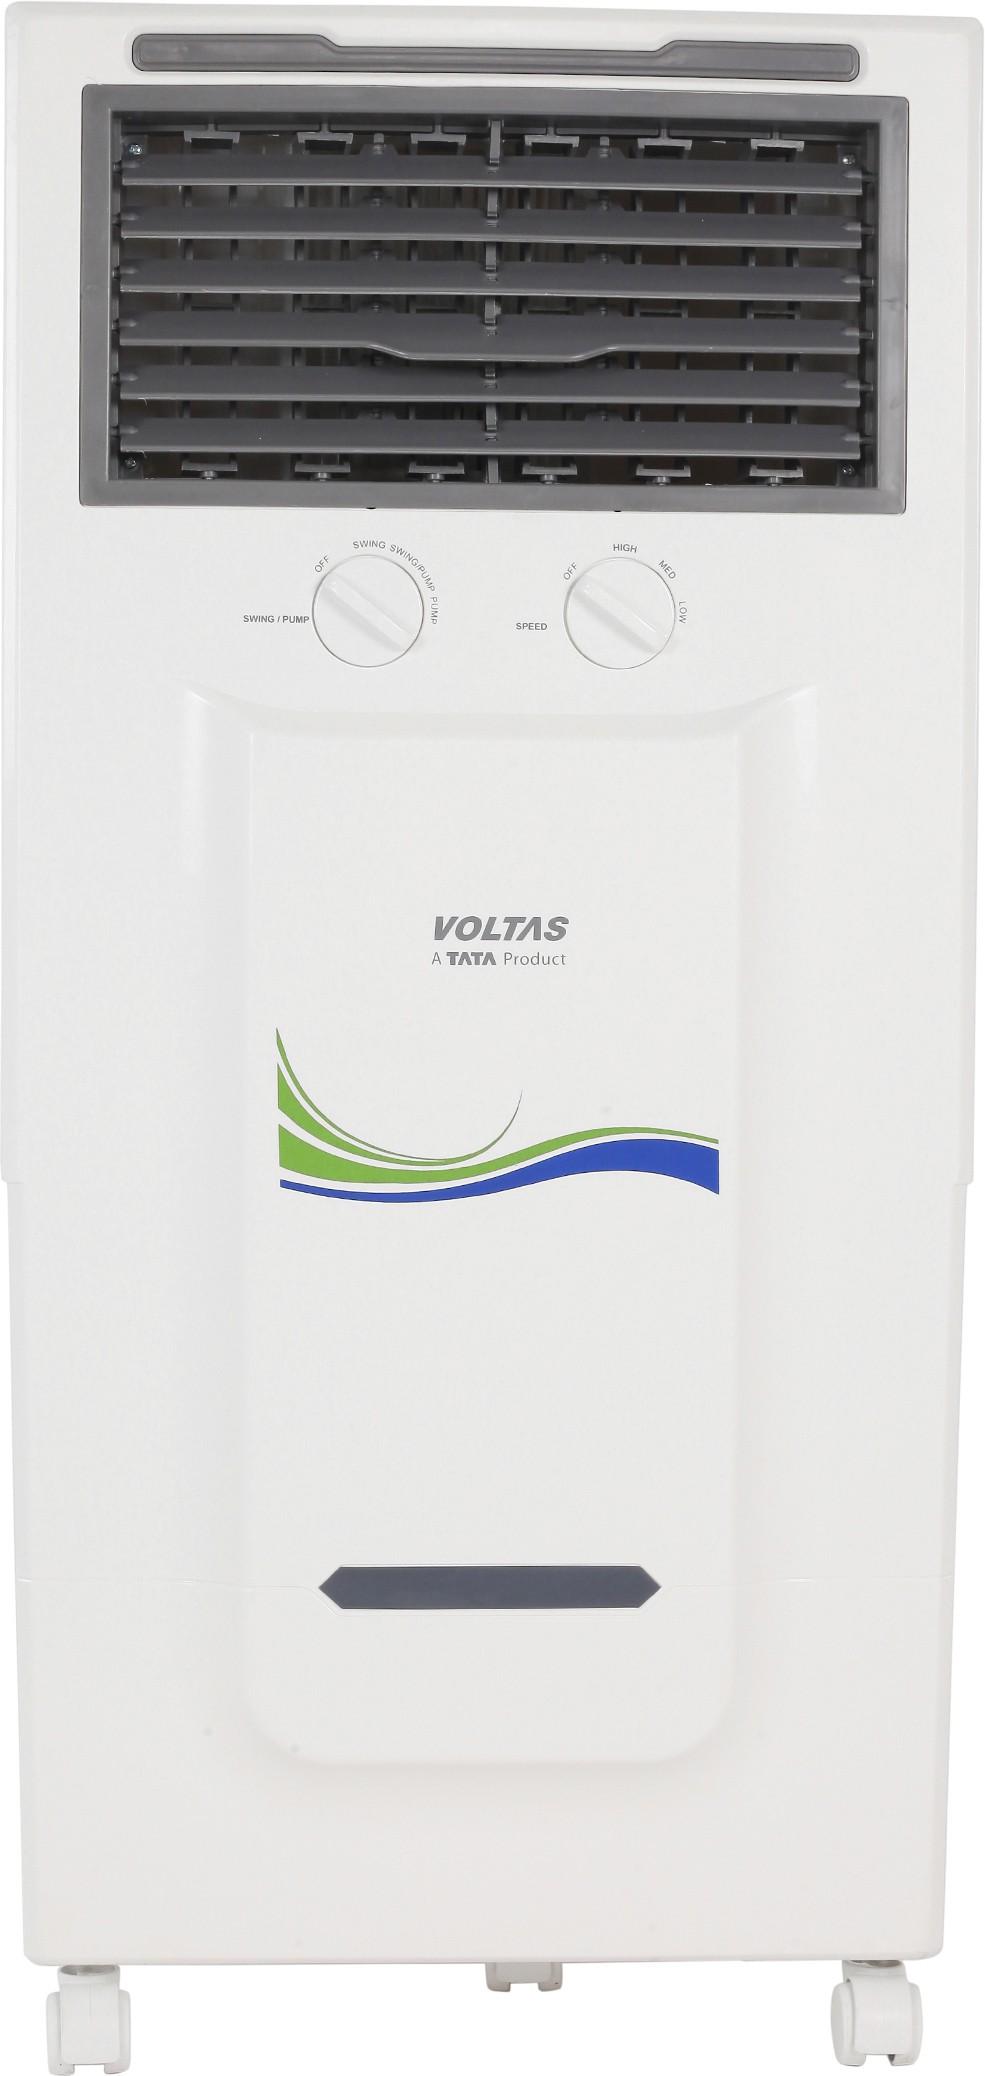 Voltas VD P34MH Personal Air Cooler Image